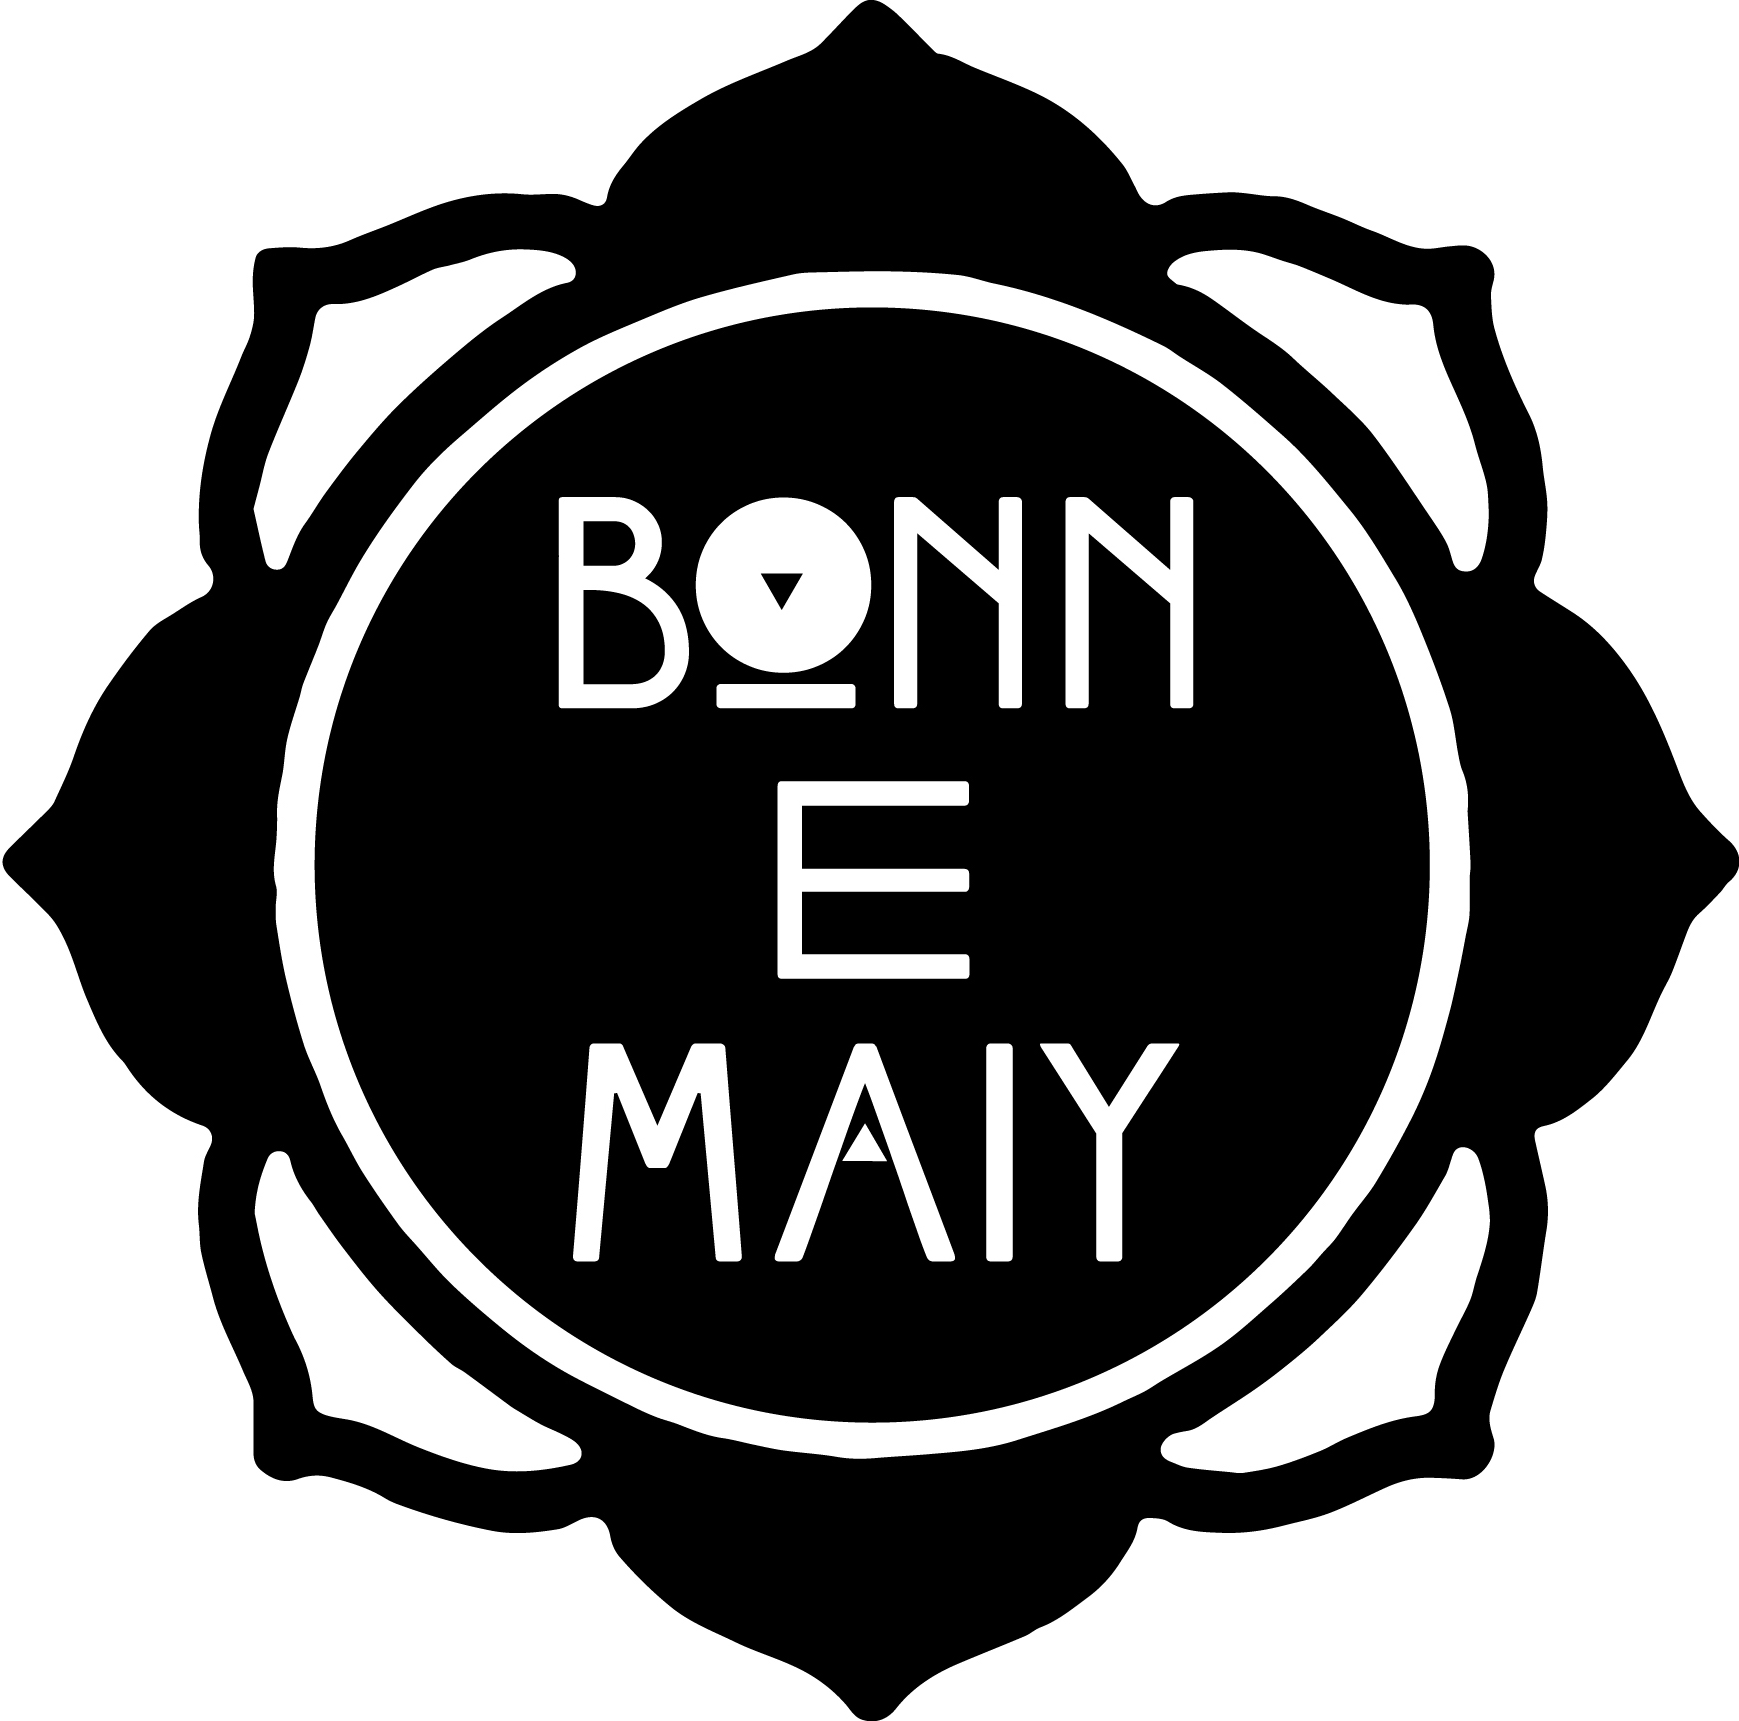 BONN-E-MAIY-Logo-SQUARE-on White.jpg